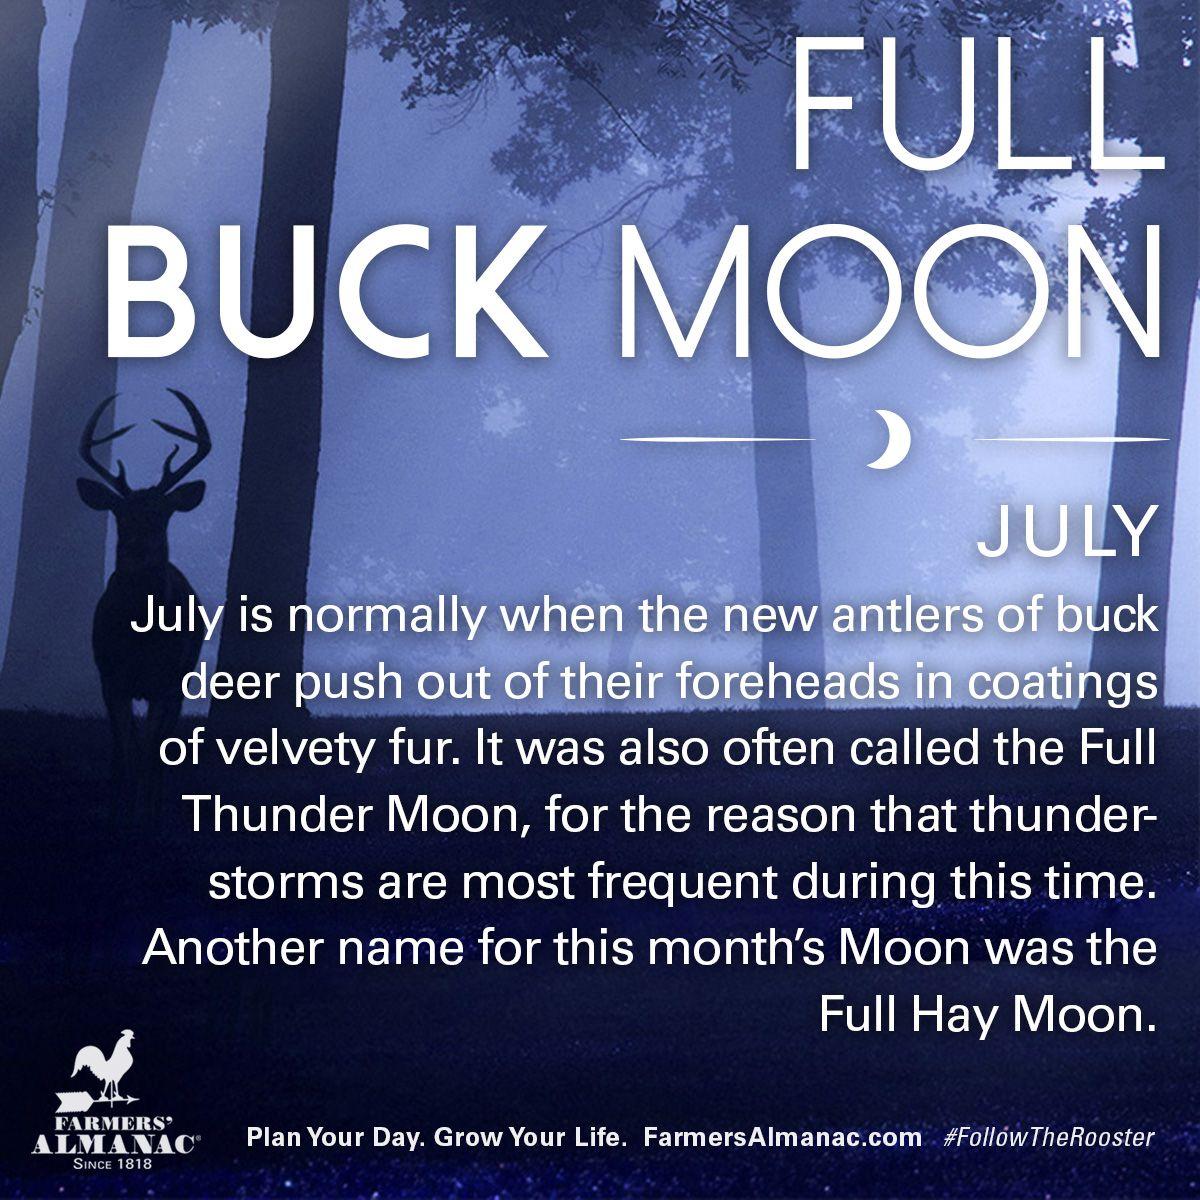 July S Full Moon Full Buck Moon Buck Moon Meaning Moon Meaning